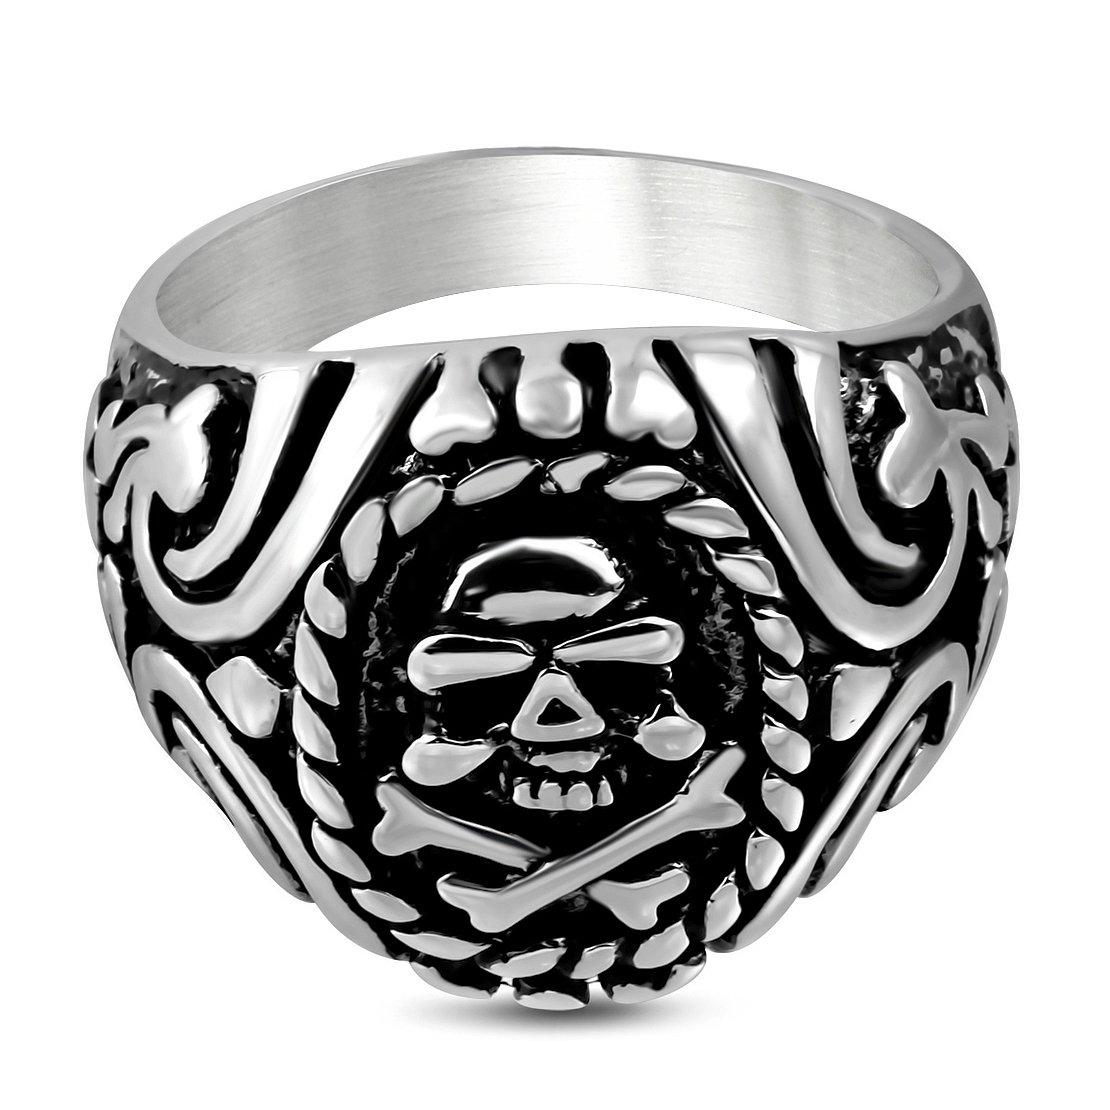 Stainless Steel 2 Color Spiral Vine Pirate Skull Crossbones Biker Ring